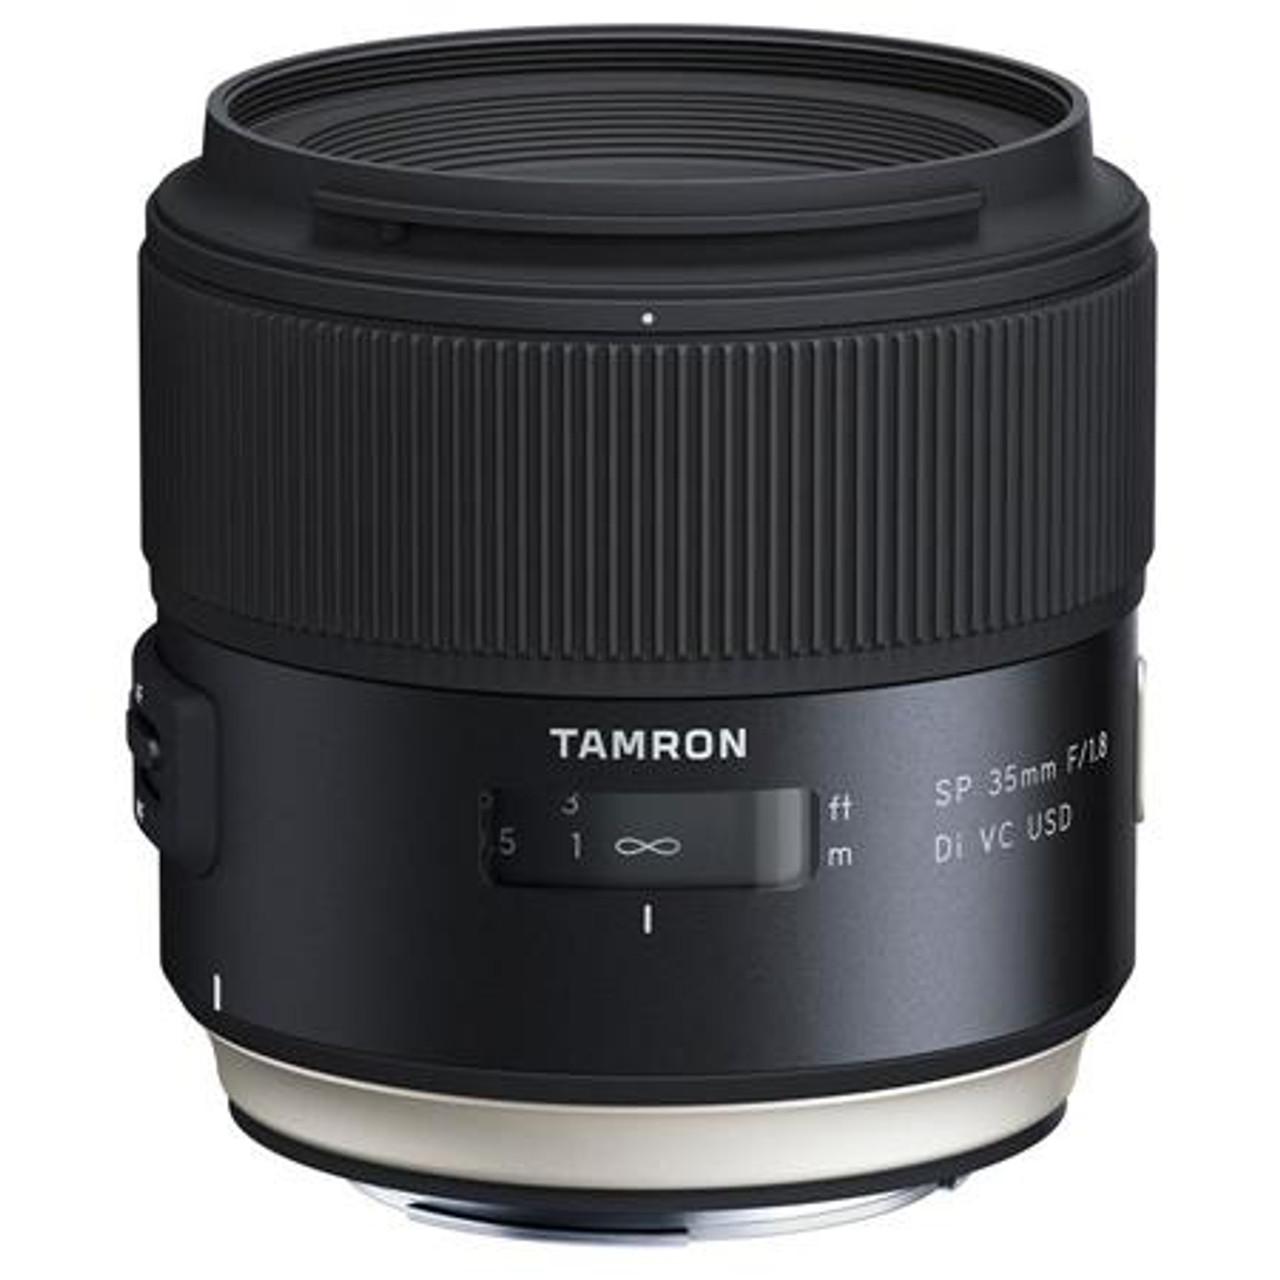 Tamron SP 35mm F/1.8 Di VC USD for Nikon Full Frame Digital SLR Cameras - U.S.A. Warranty